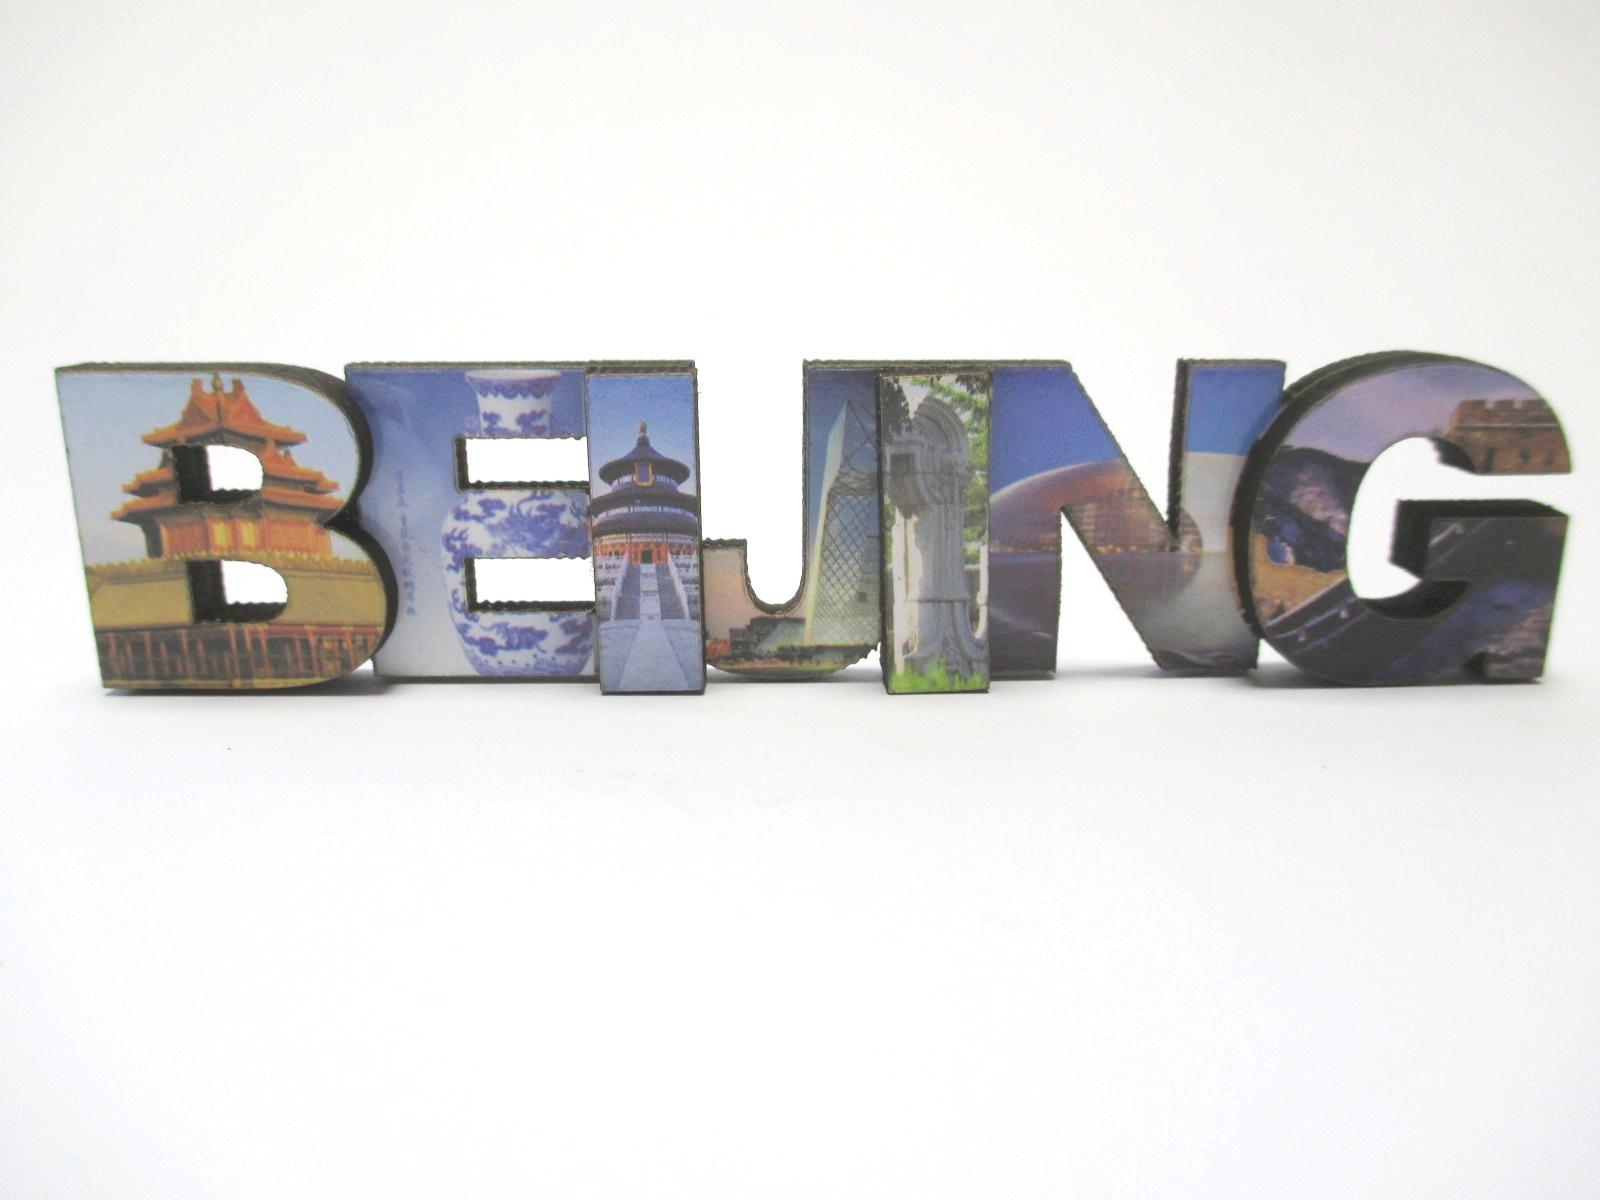 Beijing Wooden Magnet Uppercase Letters, 11 cm, Souvenir China ...